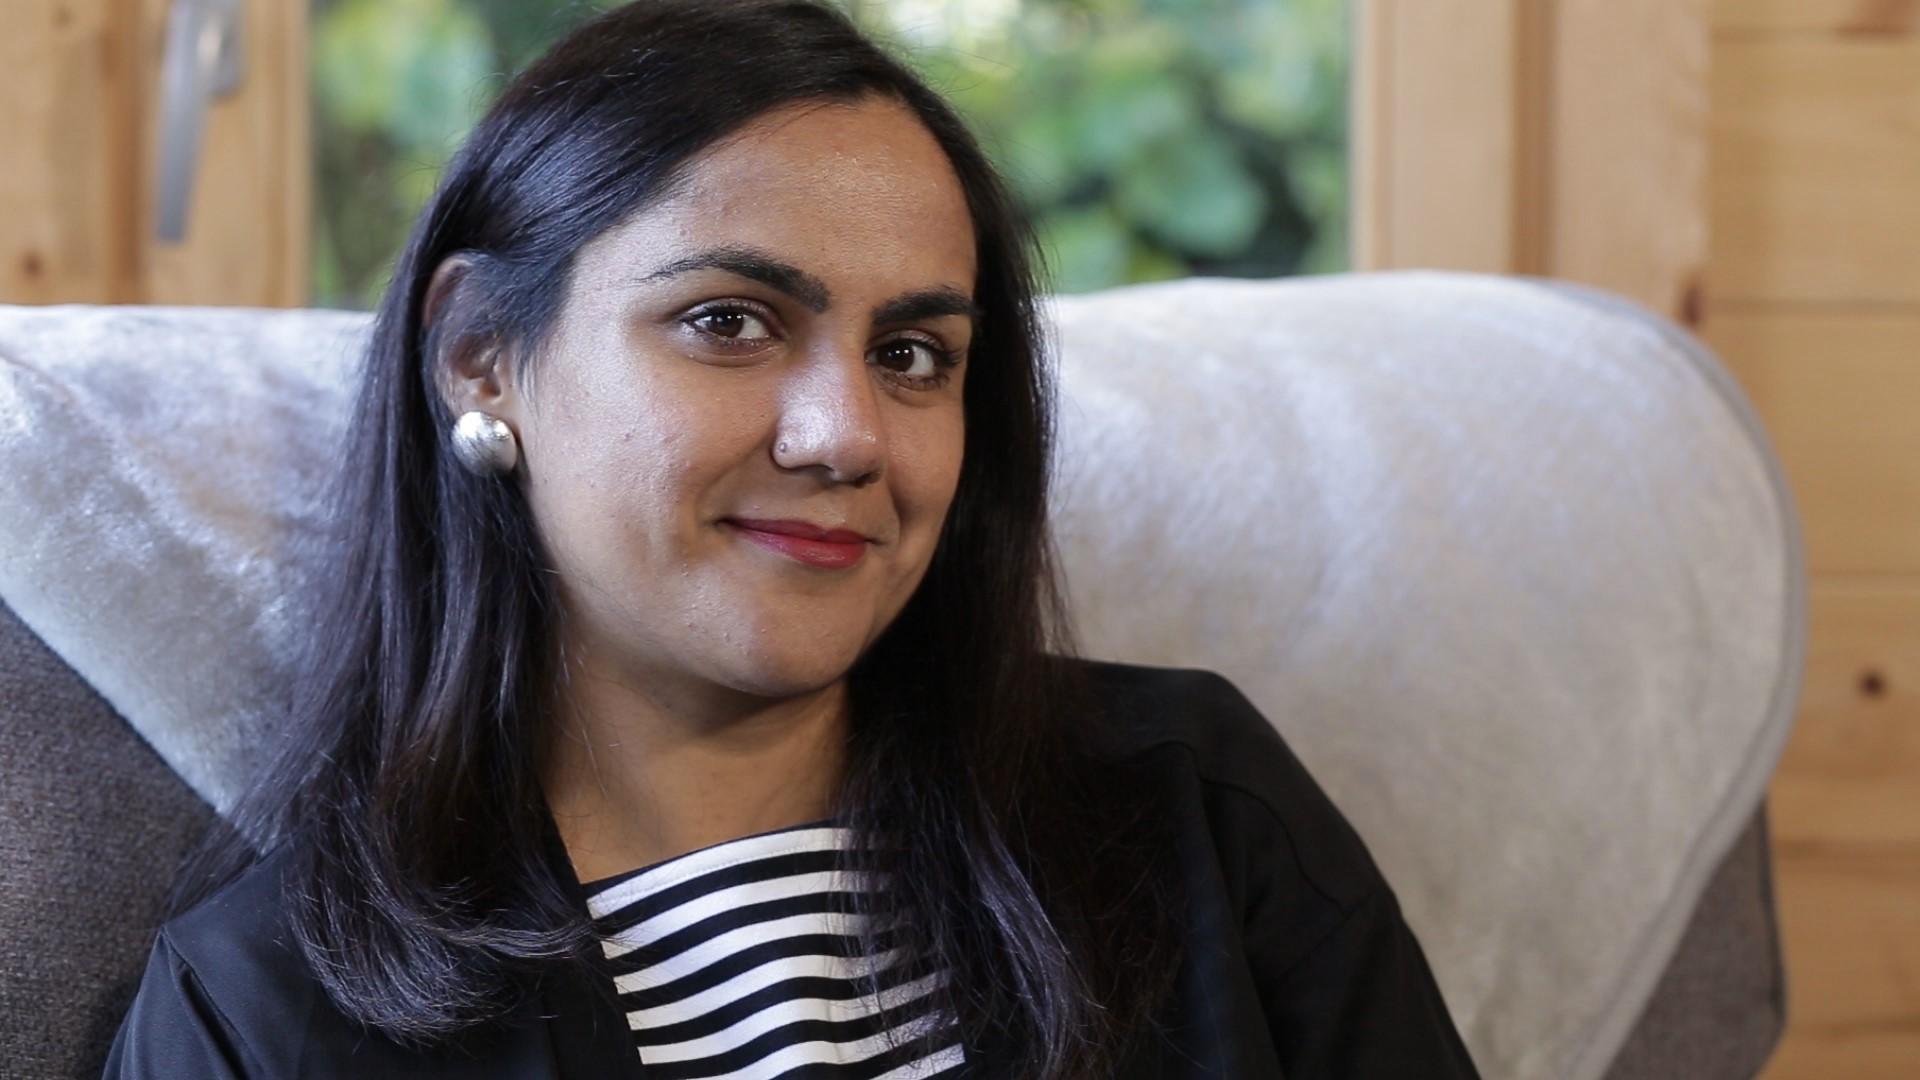 Saima smiling